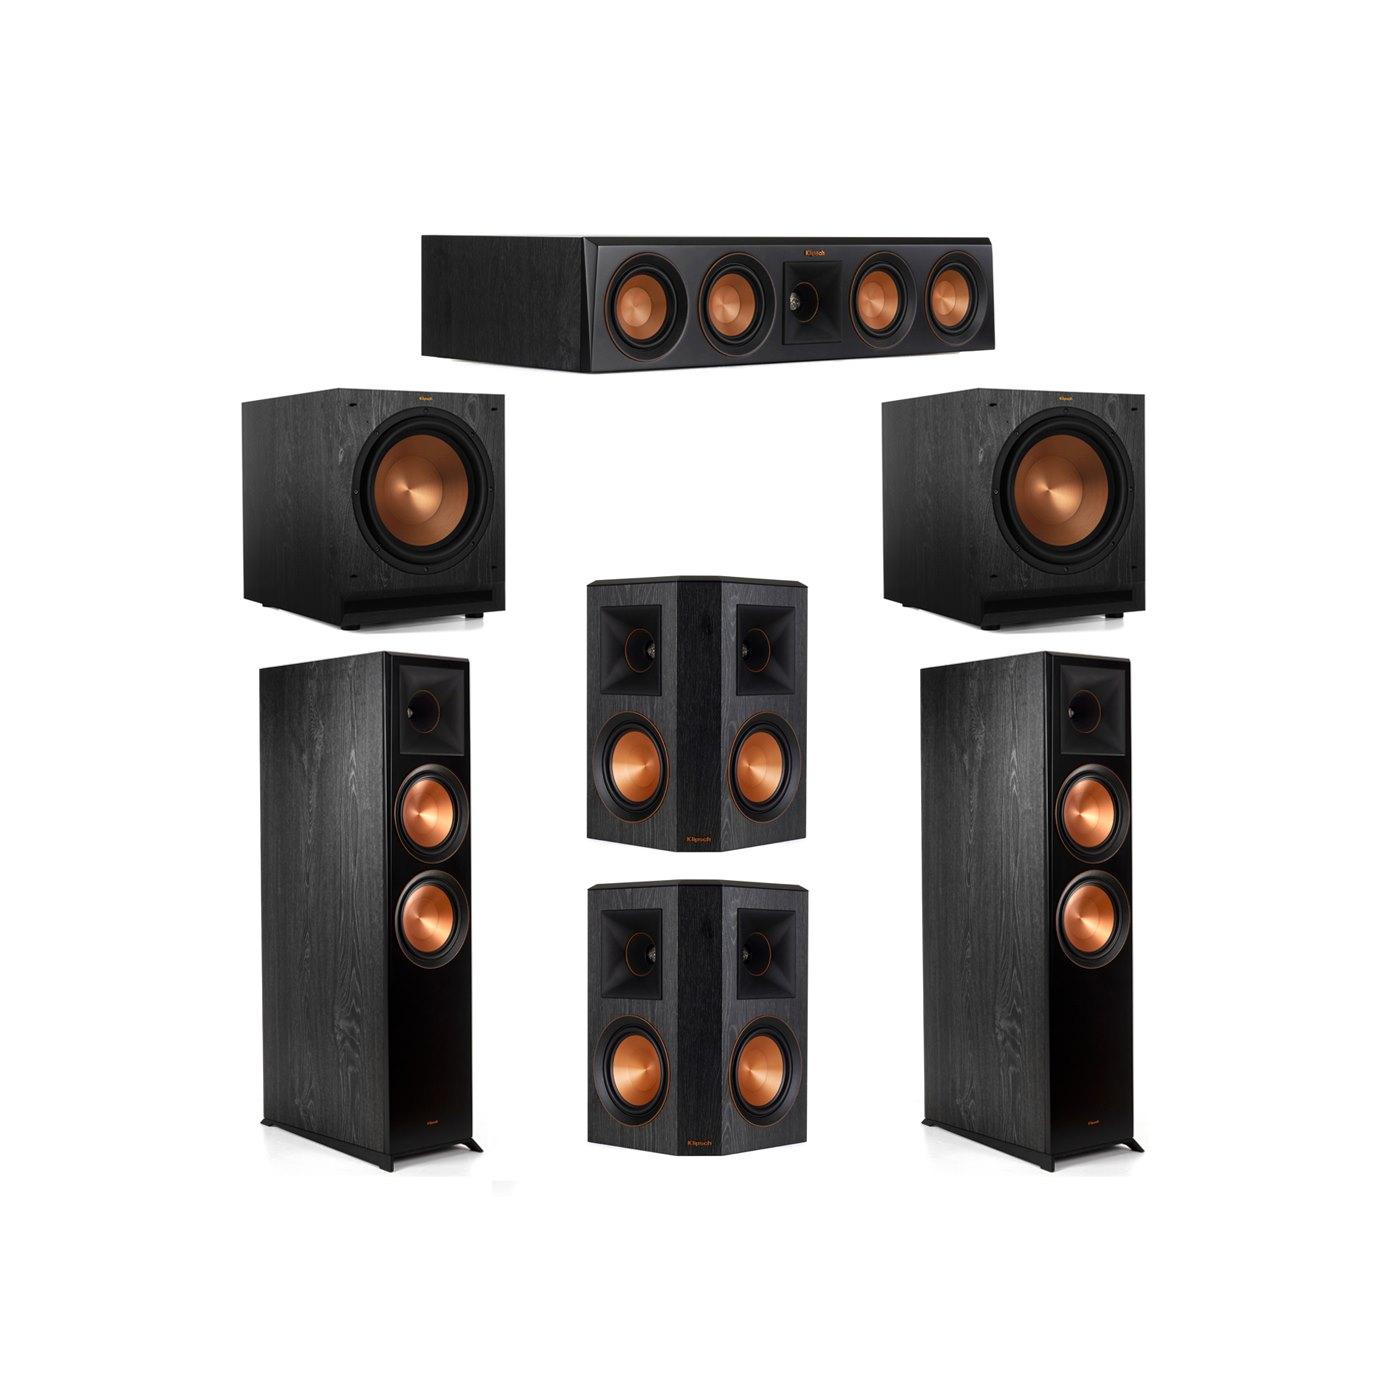 Klipsch 5.2 System with 2 RP-8000F Floorstanding Speakers, 1 Klipsch RP-404C Center Speaker, 2 Klipsch RP-502S Surround Speakers, 2 Klipsch SPL-120 Subwoofers